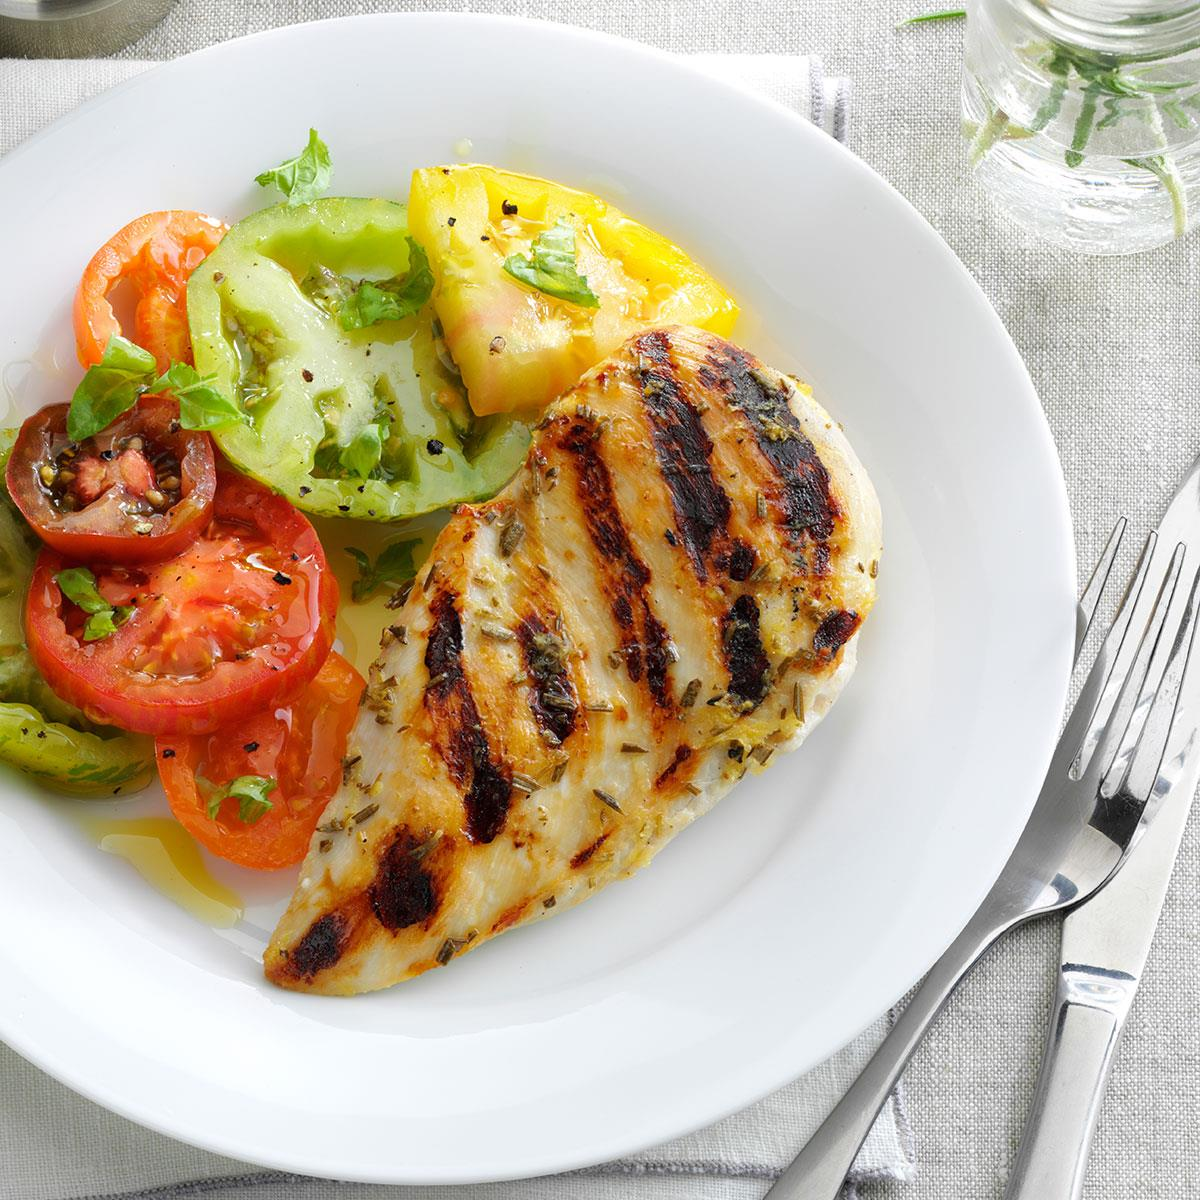 Rosemary-Lemon Grilled Chicken Recipe